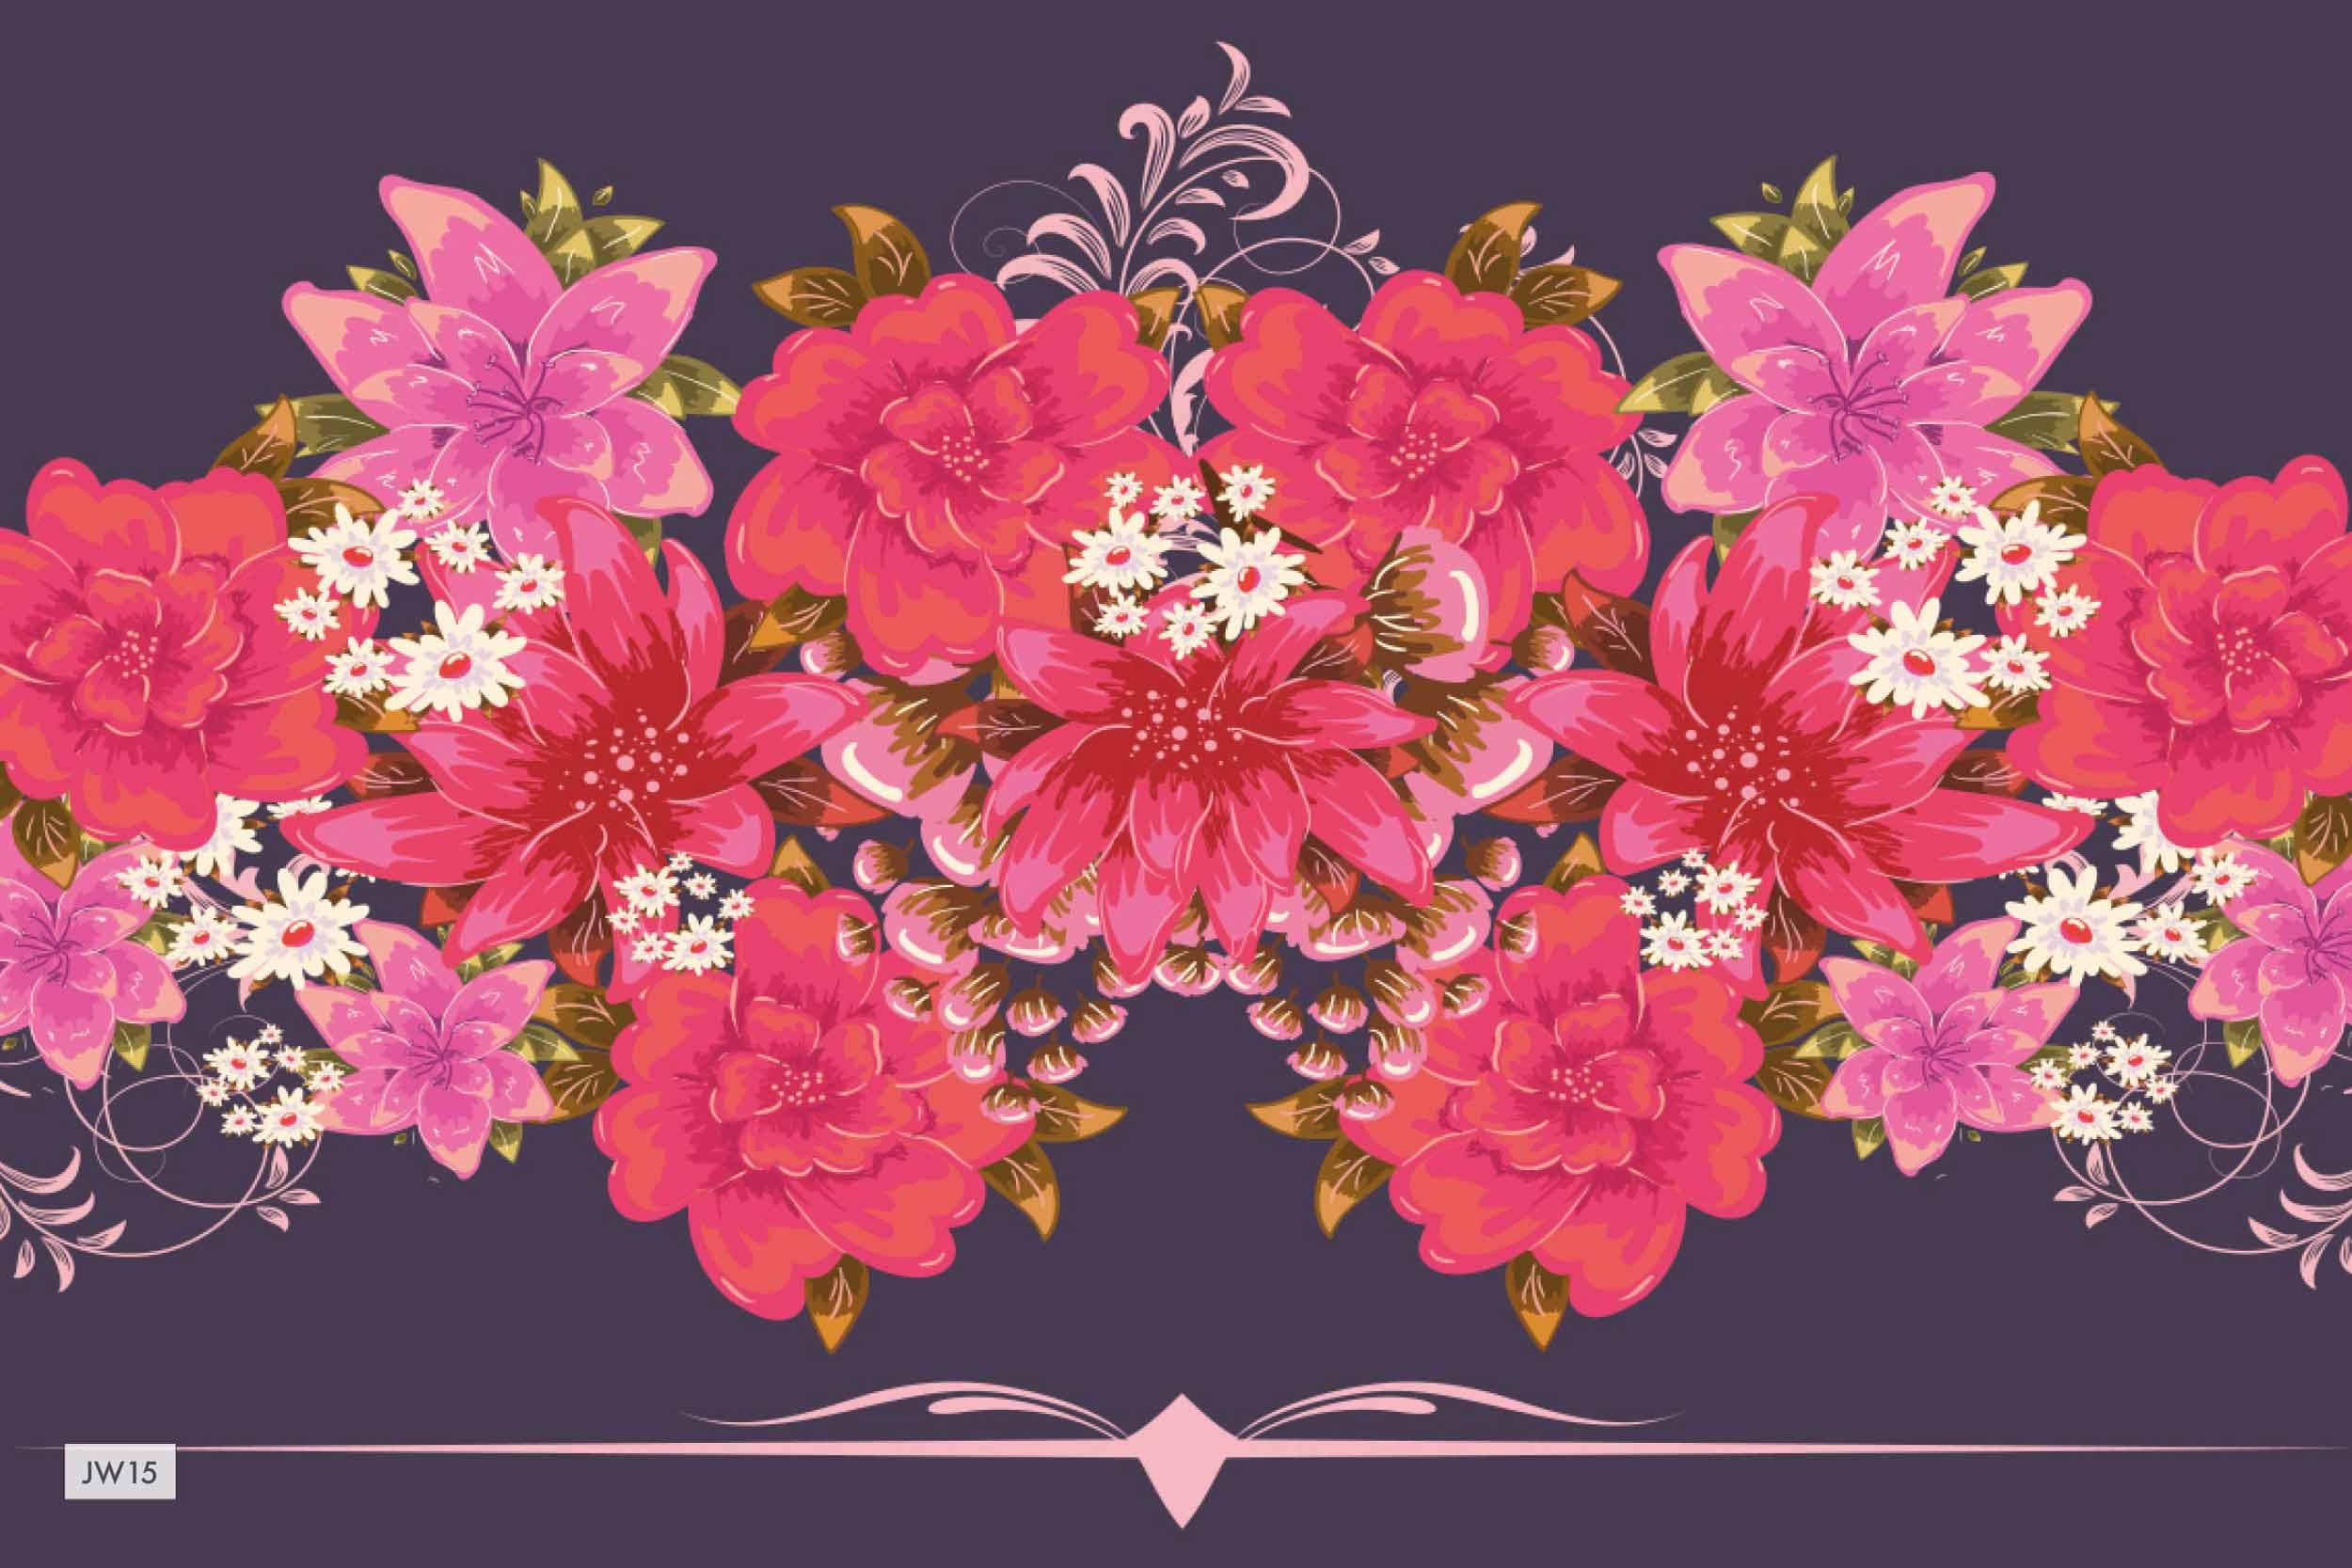 purple_pink_floral_wedding-invitation_ananyacards.com-02.jpg